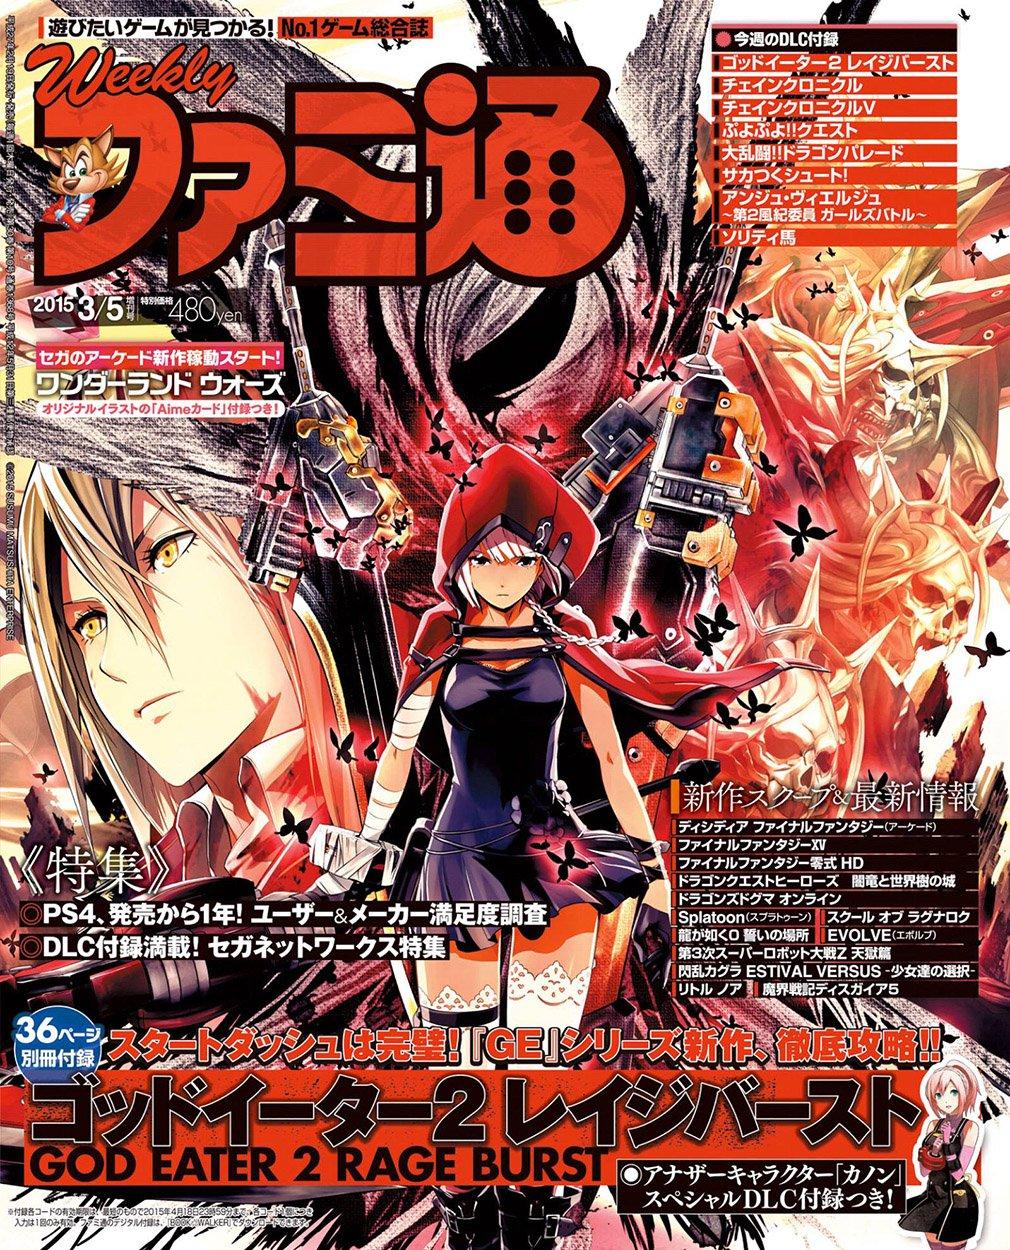 Famitsu 1368 March 5, 2015